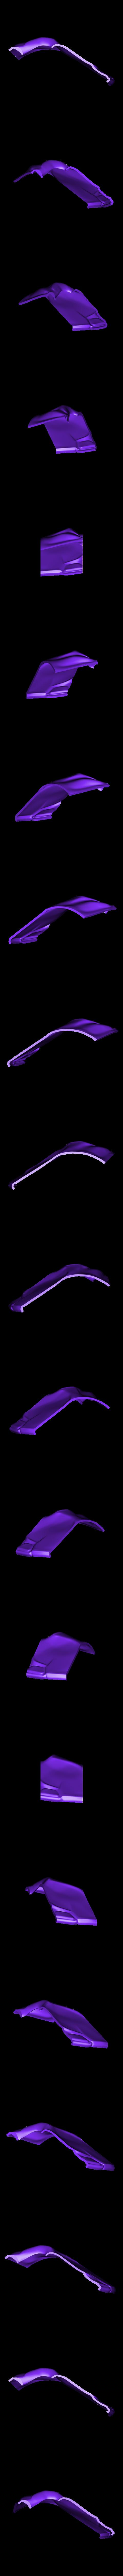 Part_4.stl Download free STL file Deathstroke Mask • 3D printable object, VillainousPropShop